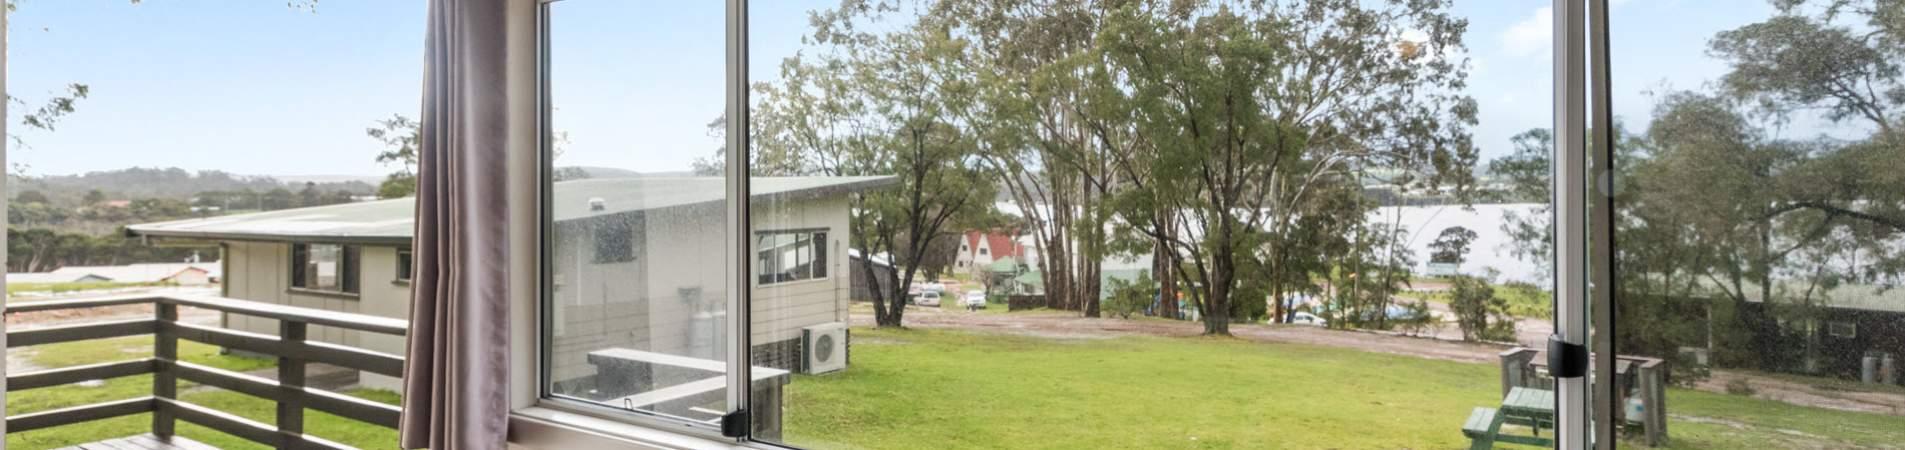 walpole rest point caravan park accommodation - banner 4